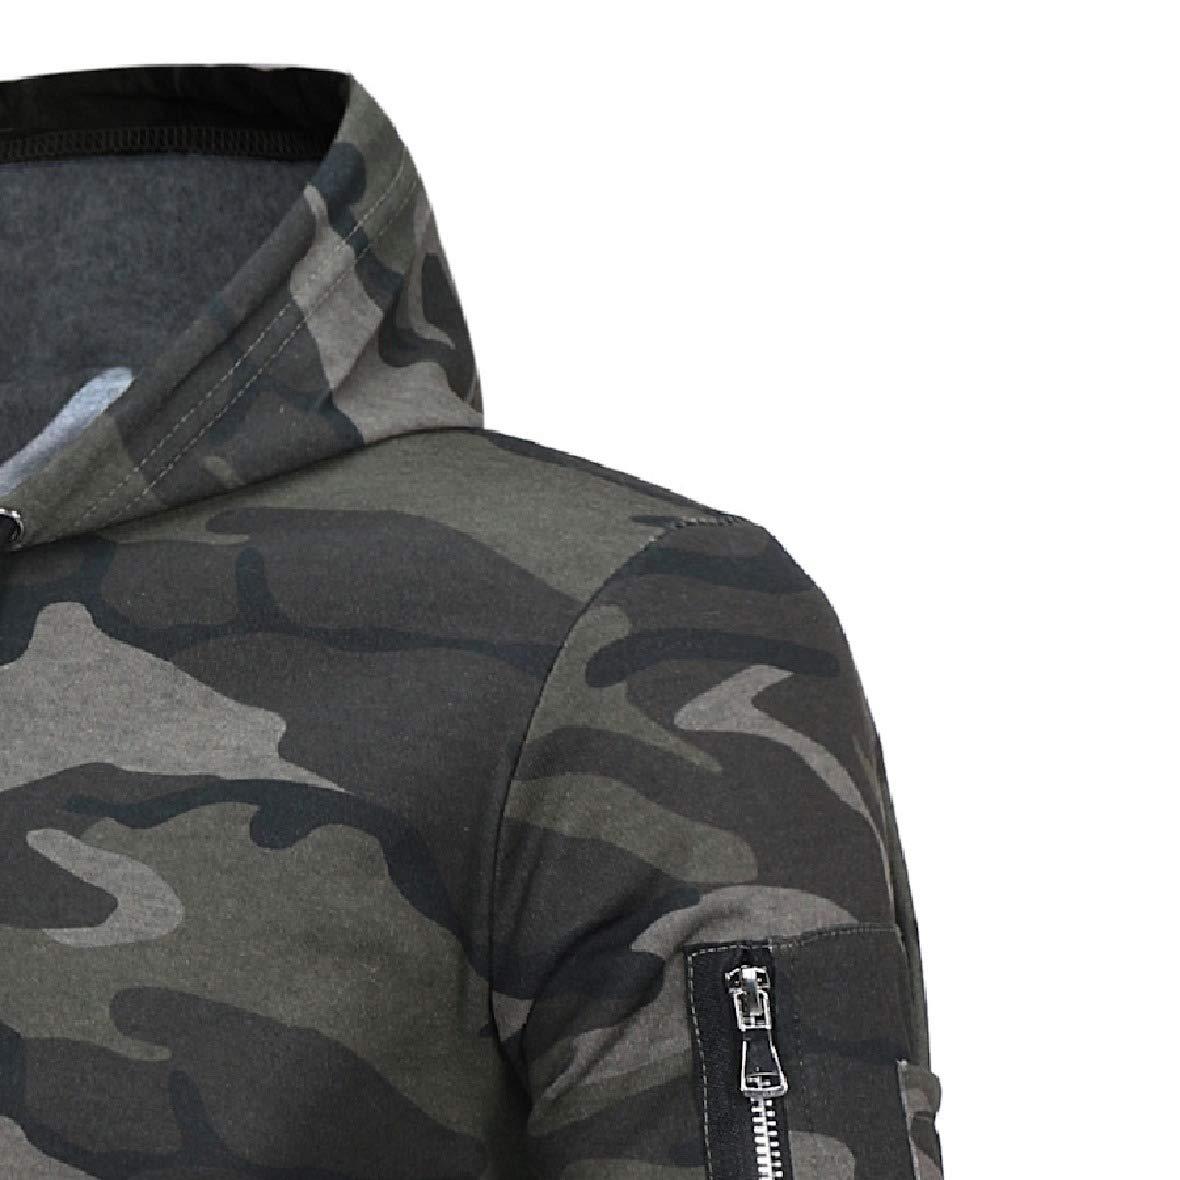 HEFASDM Mens Hoode Casual Loose Pullover Camouflage Color Sweatshirt